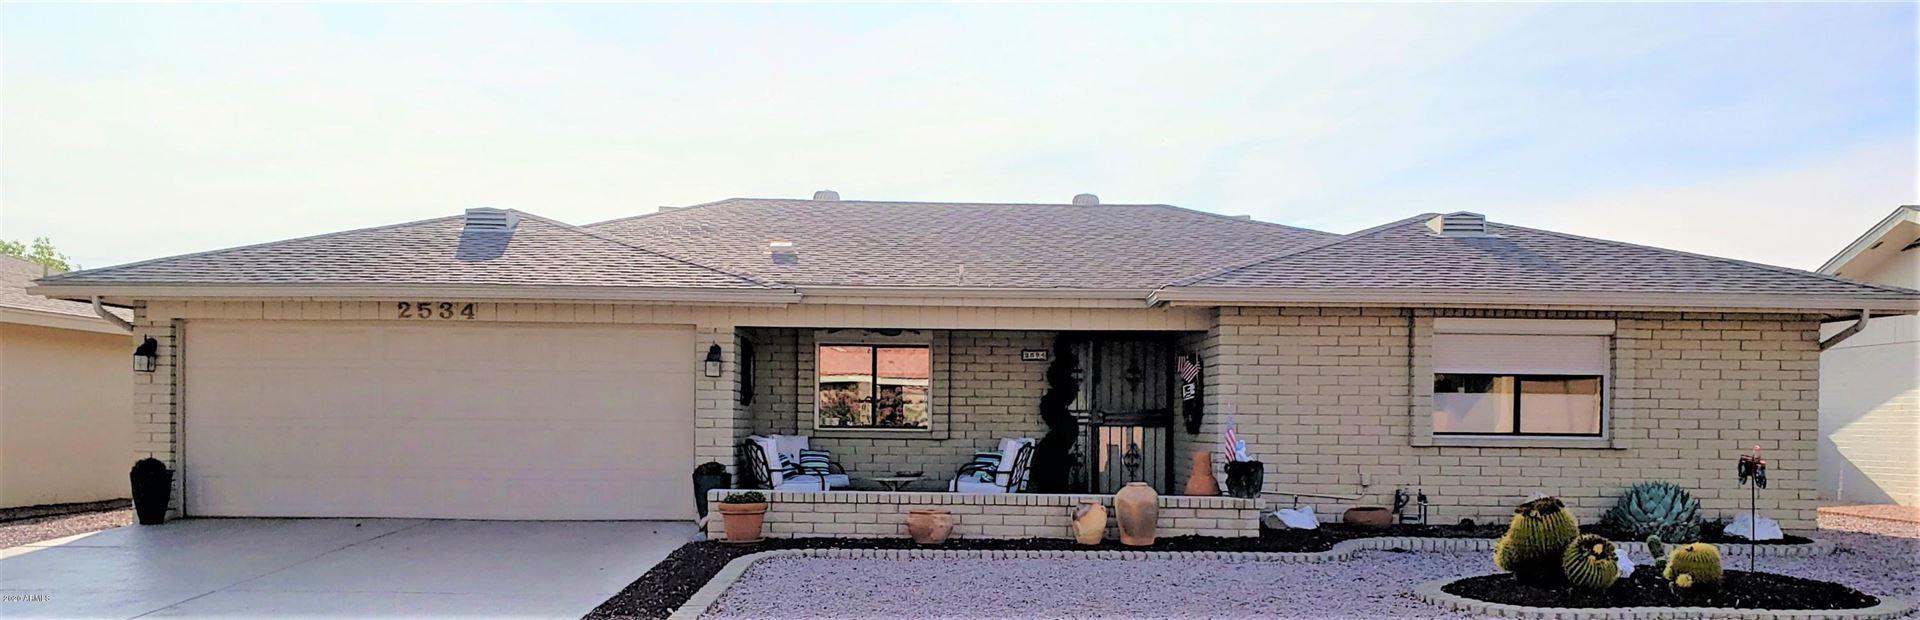 2534 S PERIWINKLE --, Mesa, AZ 85209 - MLS#: 6133883